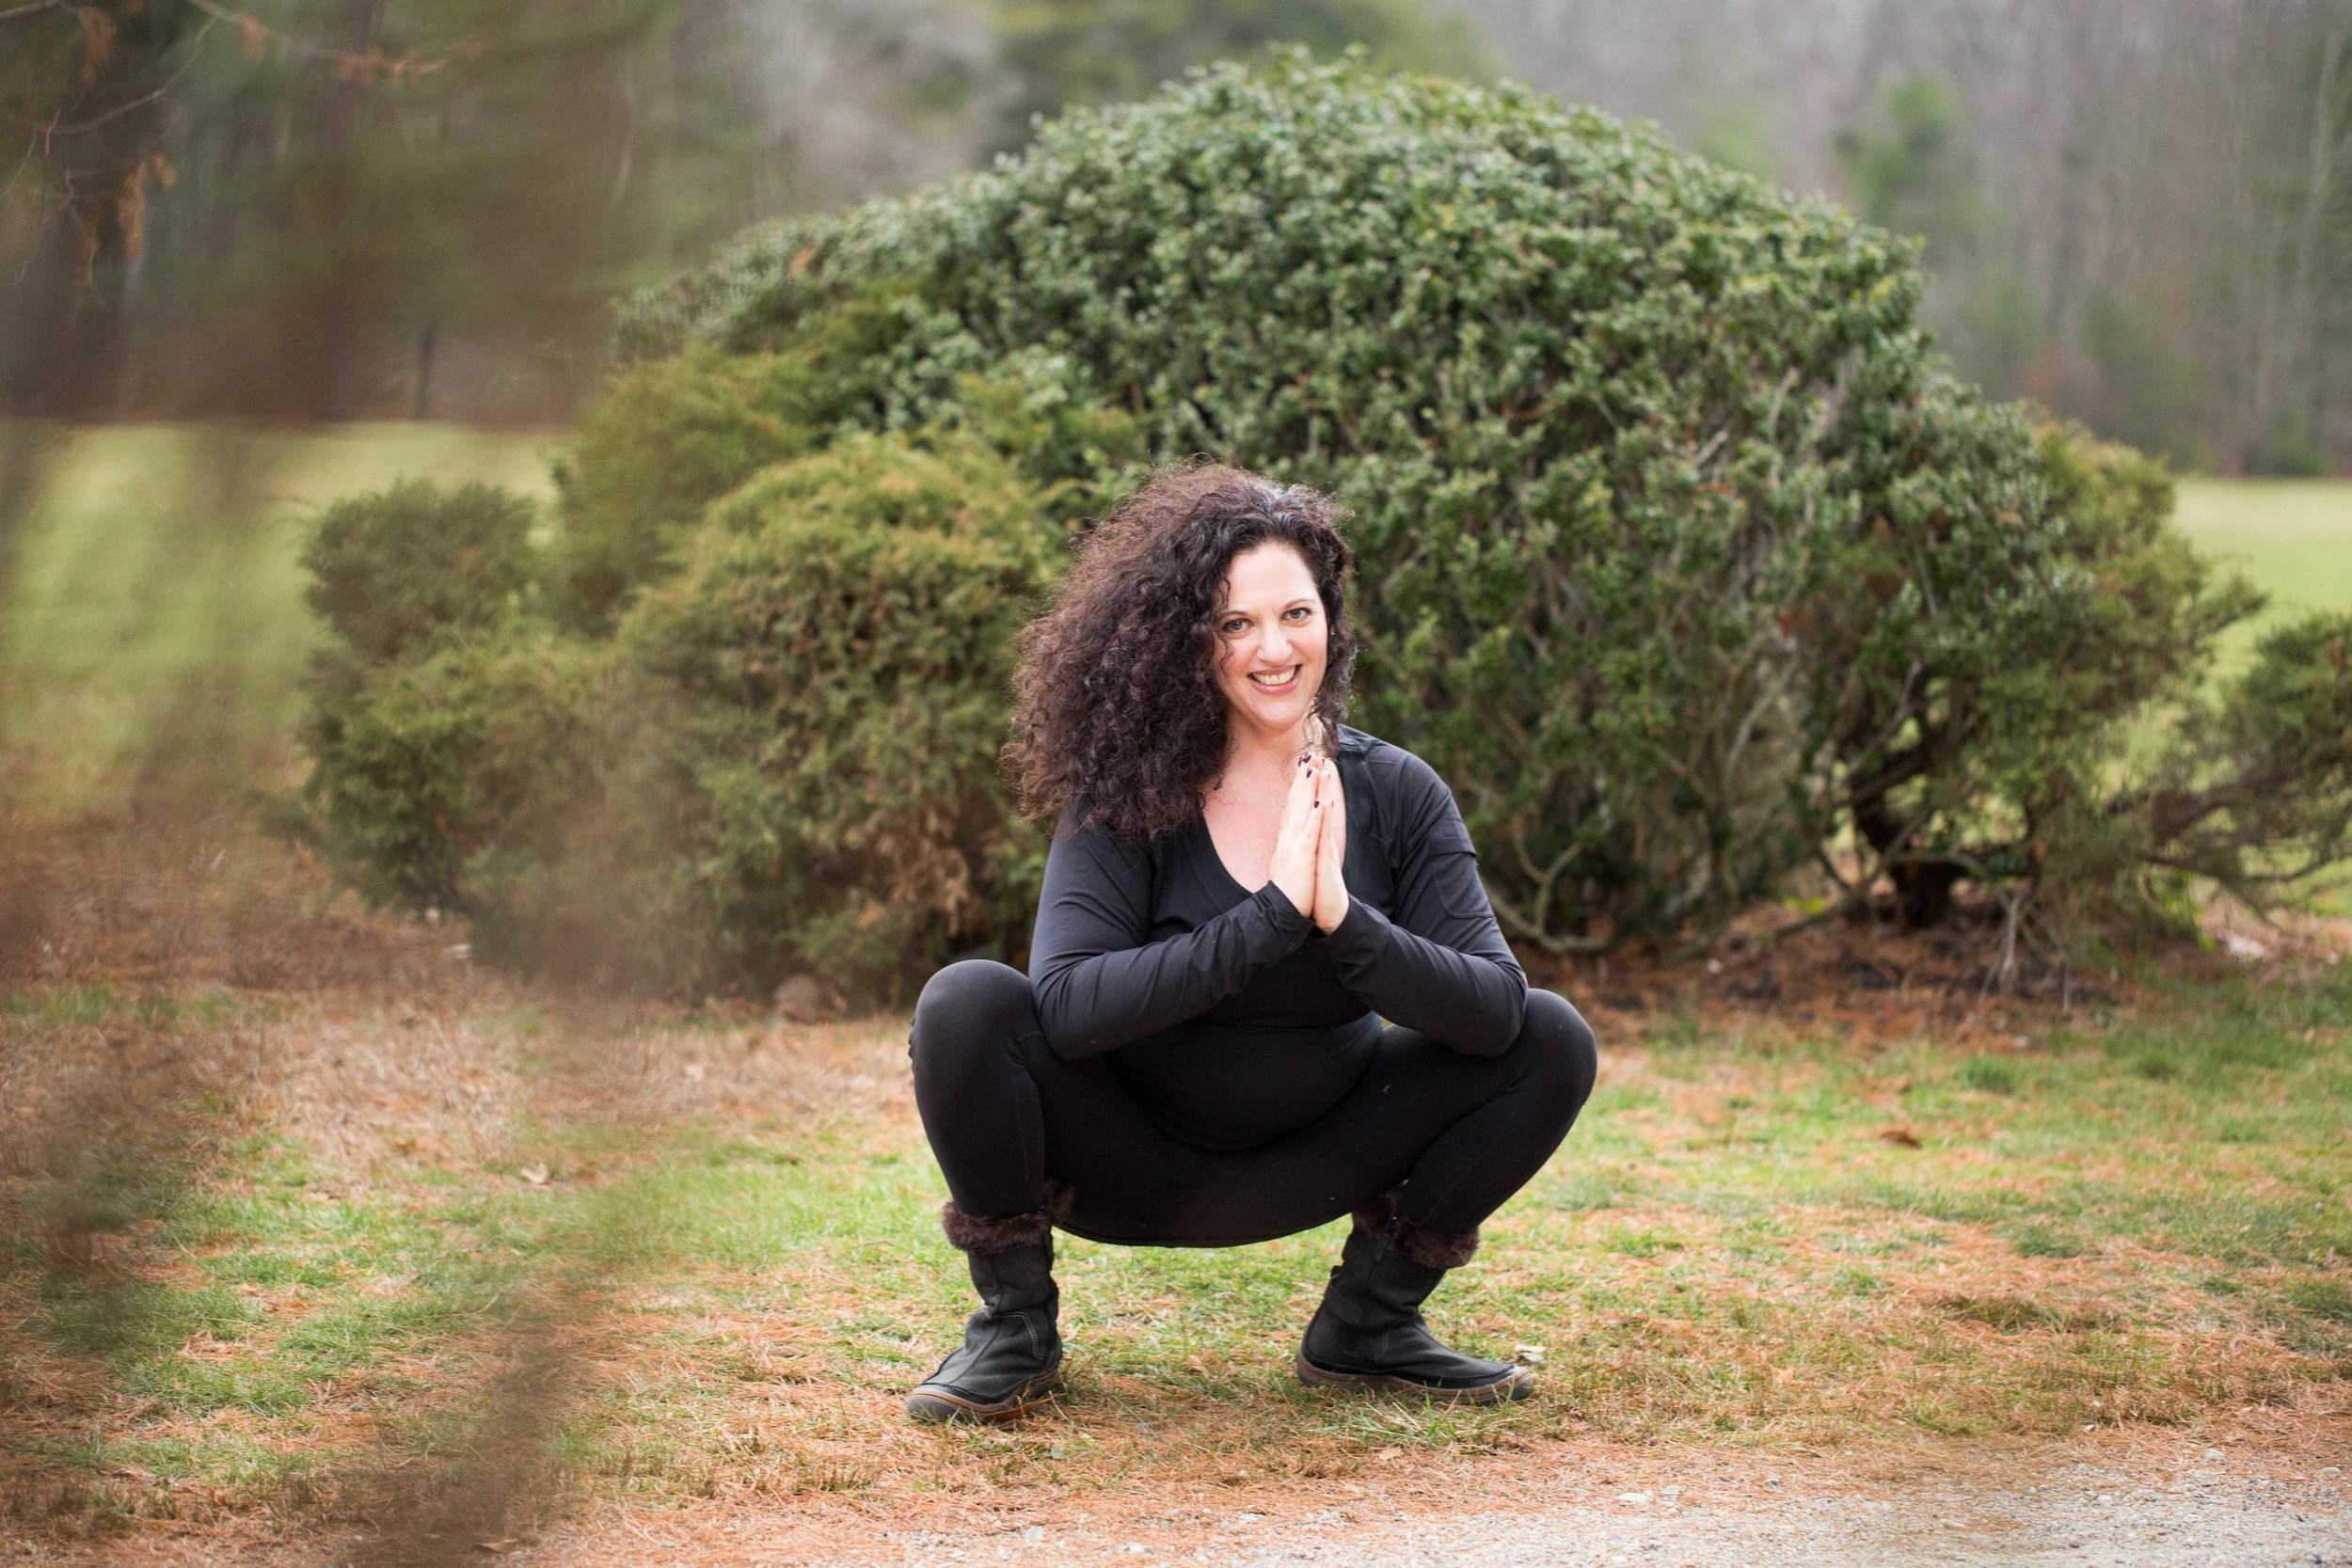 Tracy_Rodriguez_Photography_Yoga_Portfolio_Elyse_Callahan-2891.jpg